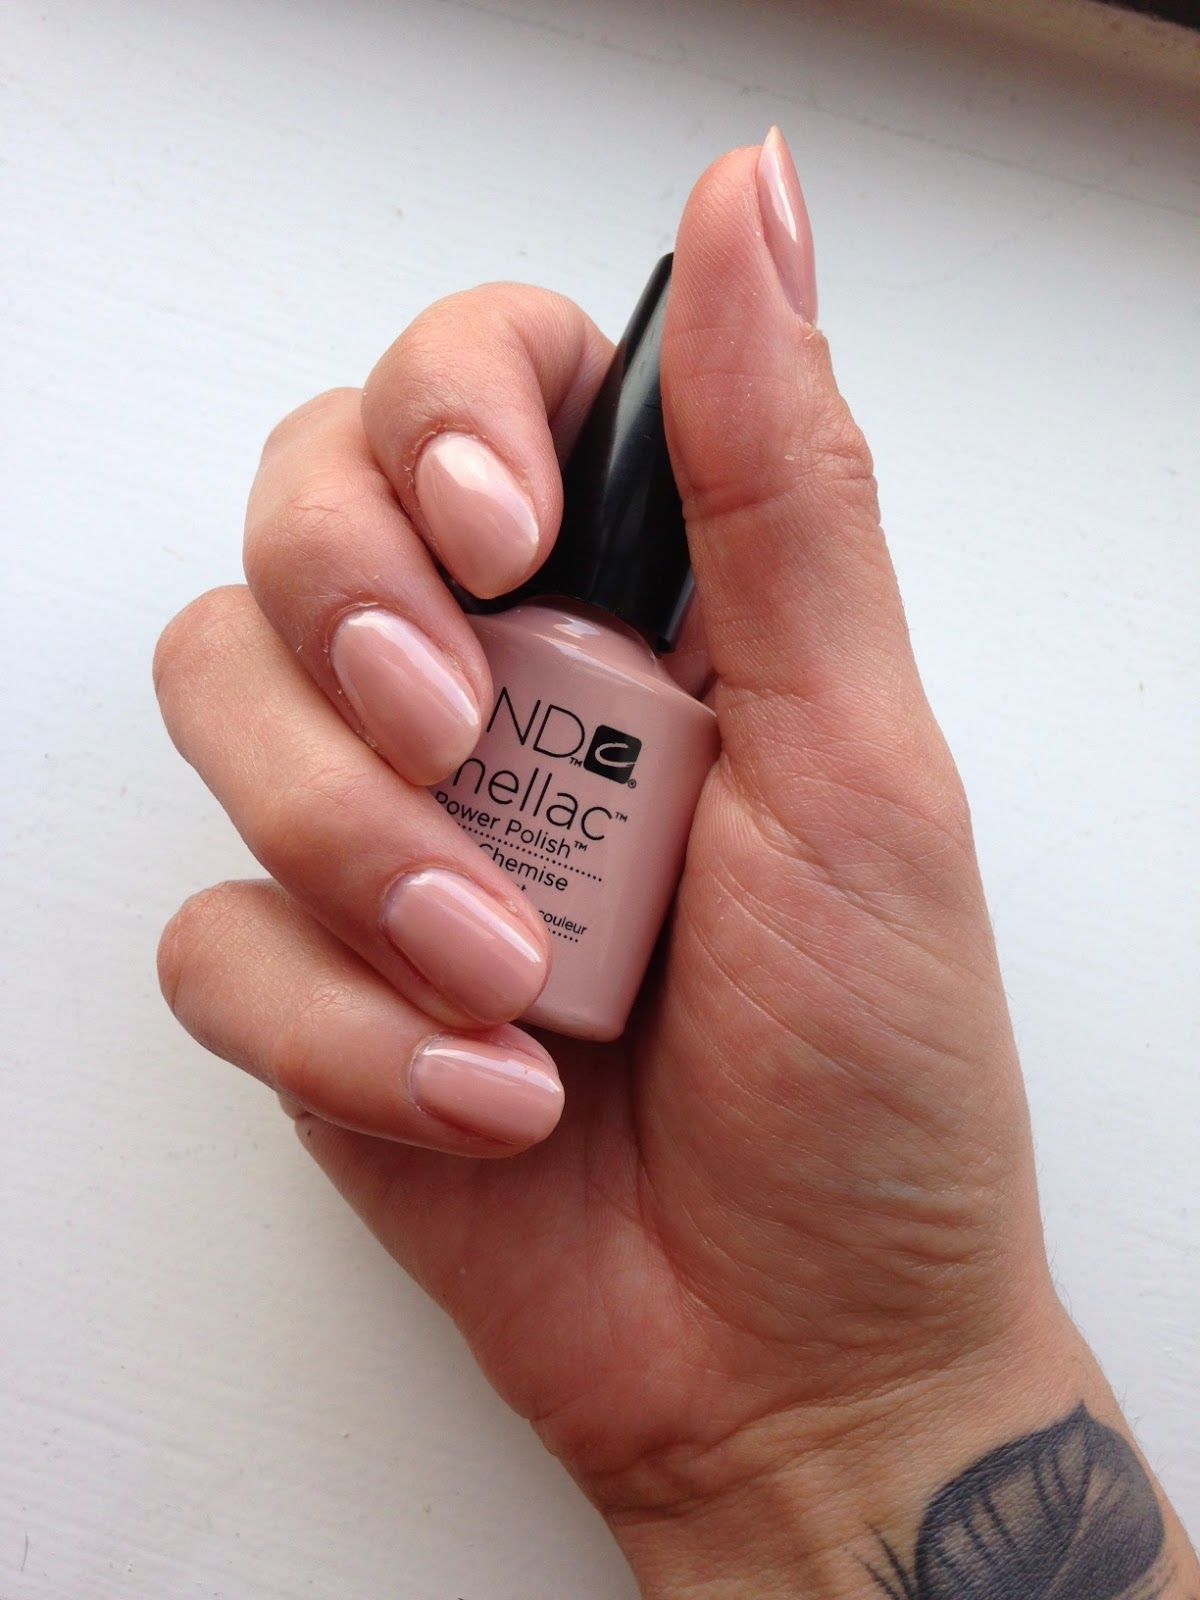 Pin by 🌟 Ely 🌟 on Shellac!   Gel nail colors, Nail colors